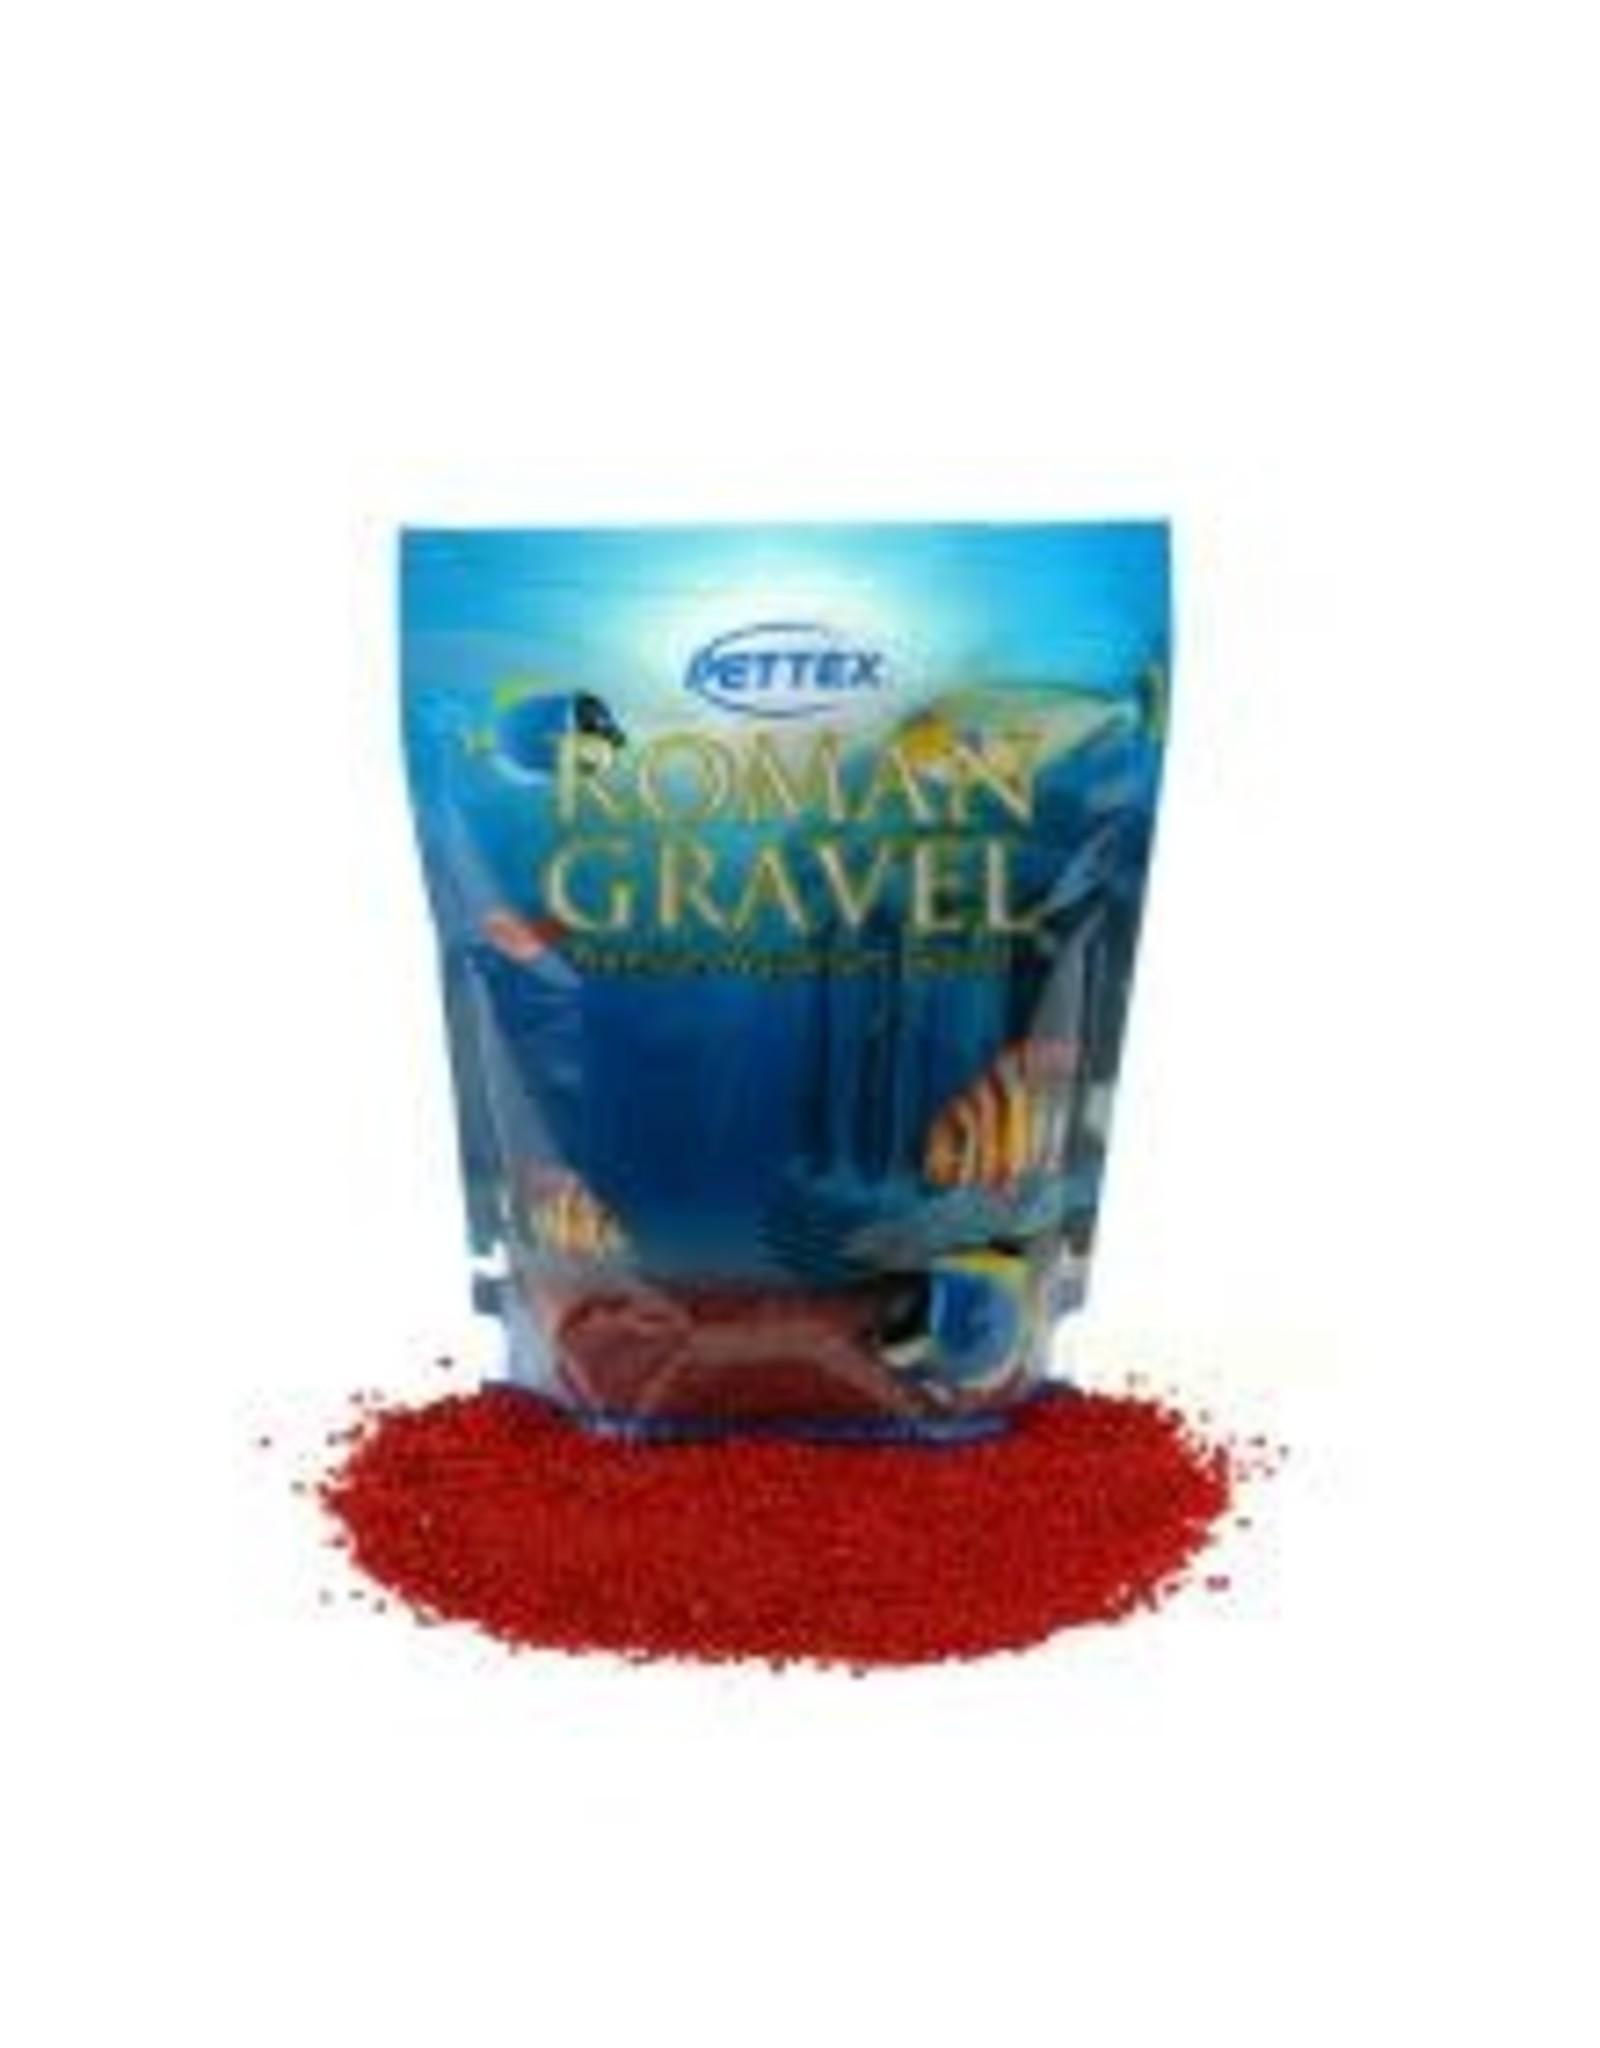 Pettex Roman Gravel 2kg